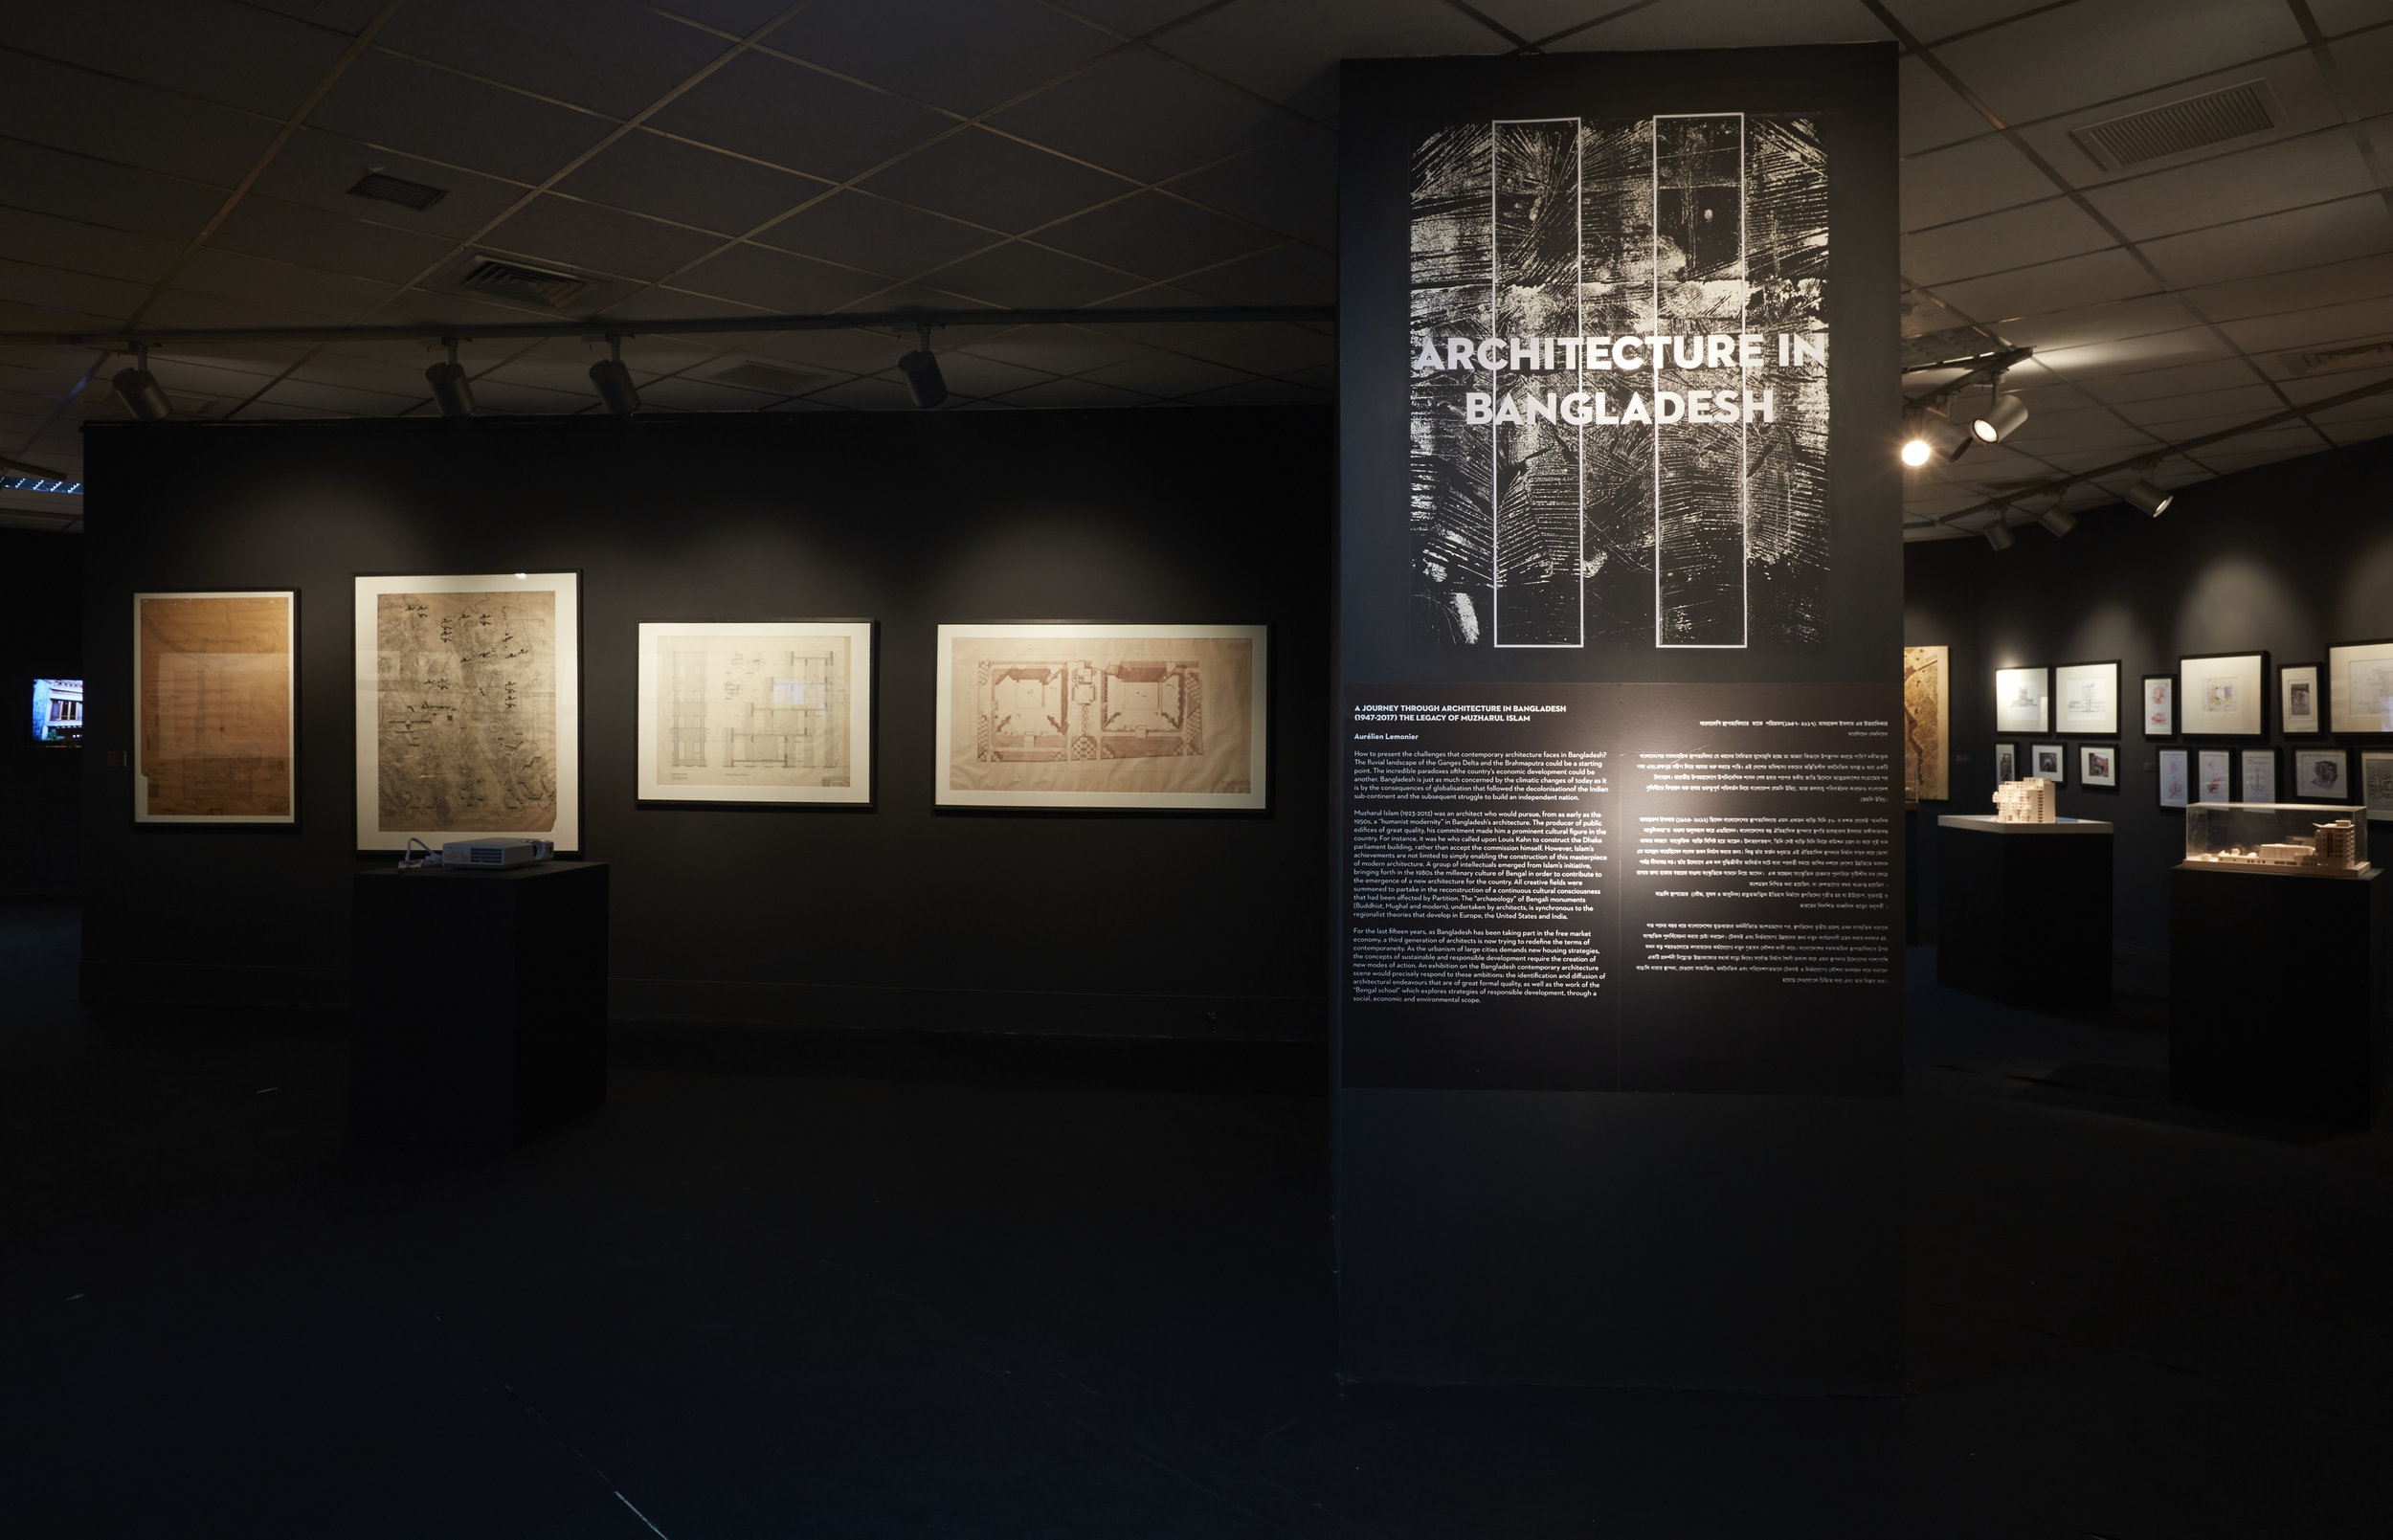 Works by Muzharul Islam, installation view. Photo courtesy of the Dhaka Art Summit and Samdani Art Foundation.Photo credit: Jenni Carter